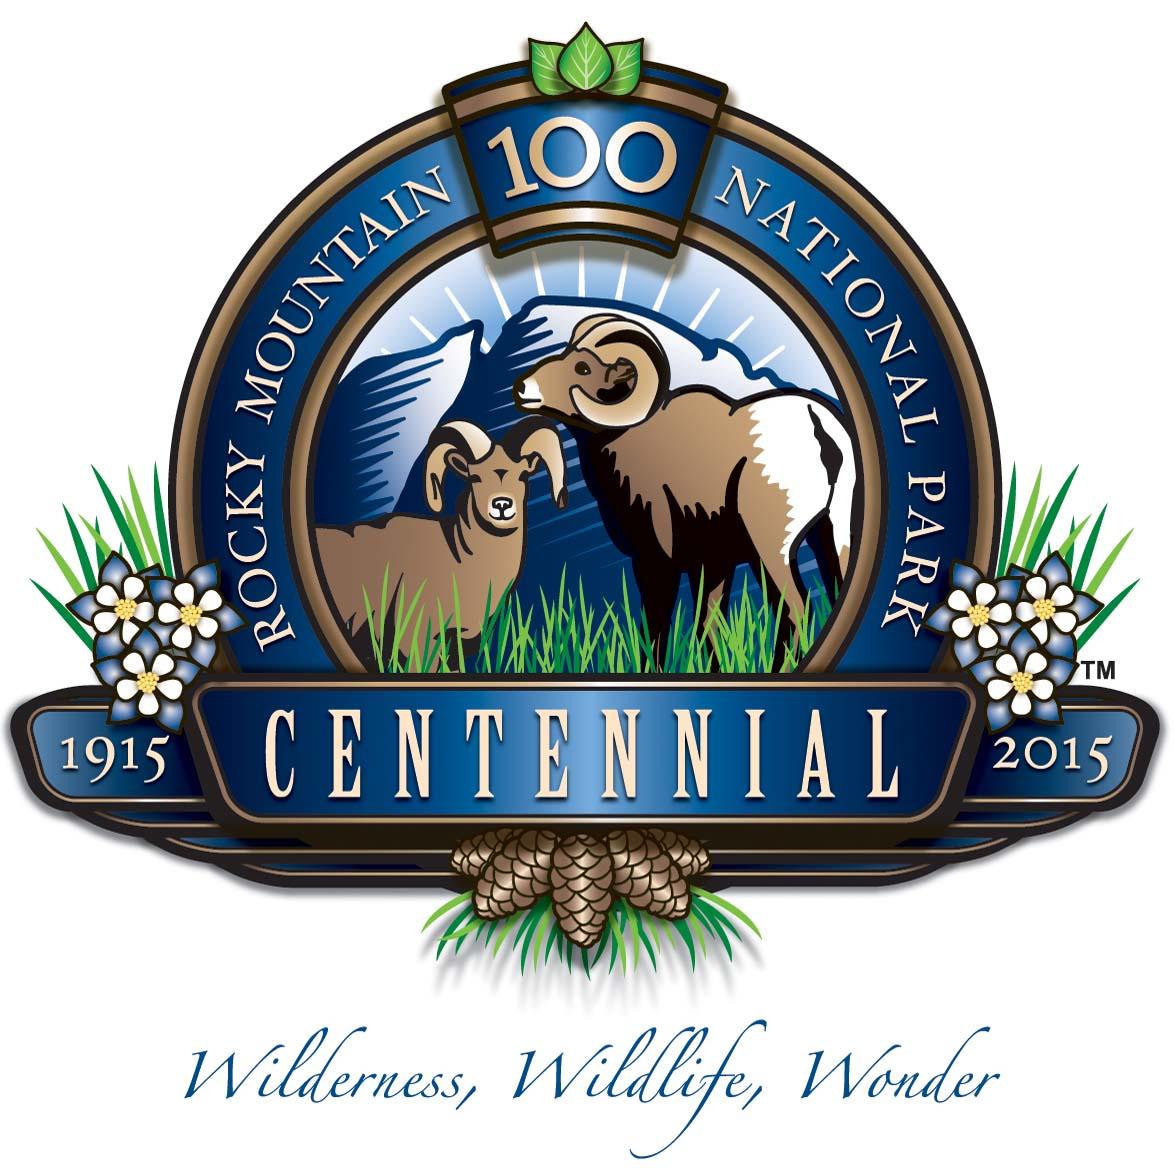 rocky mountain national park unveils centennial logo